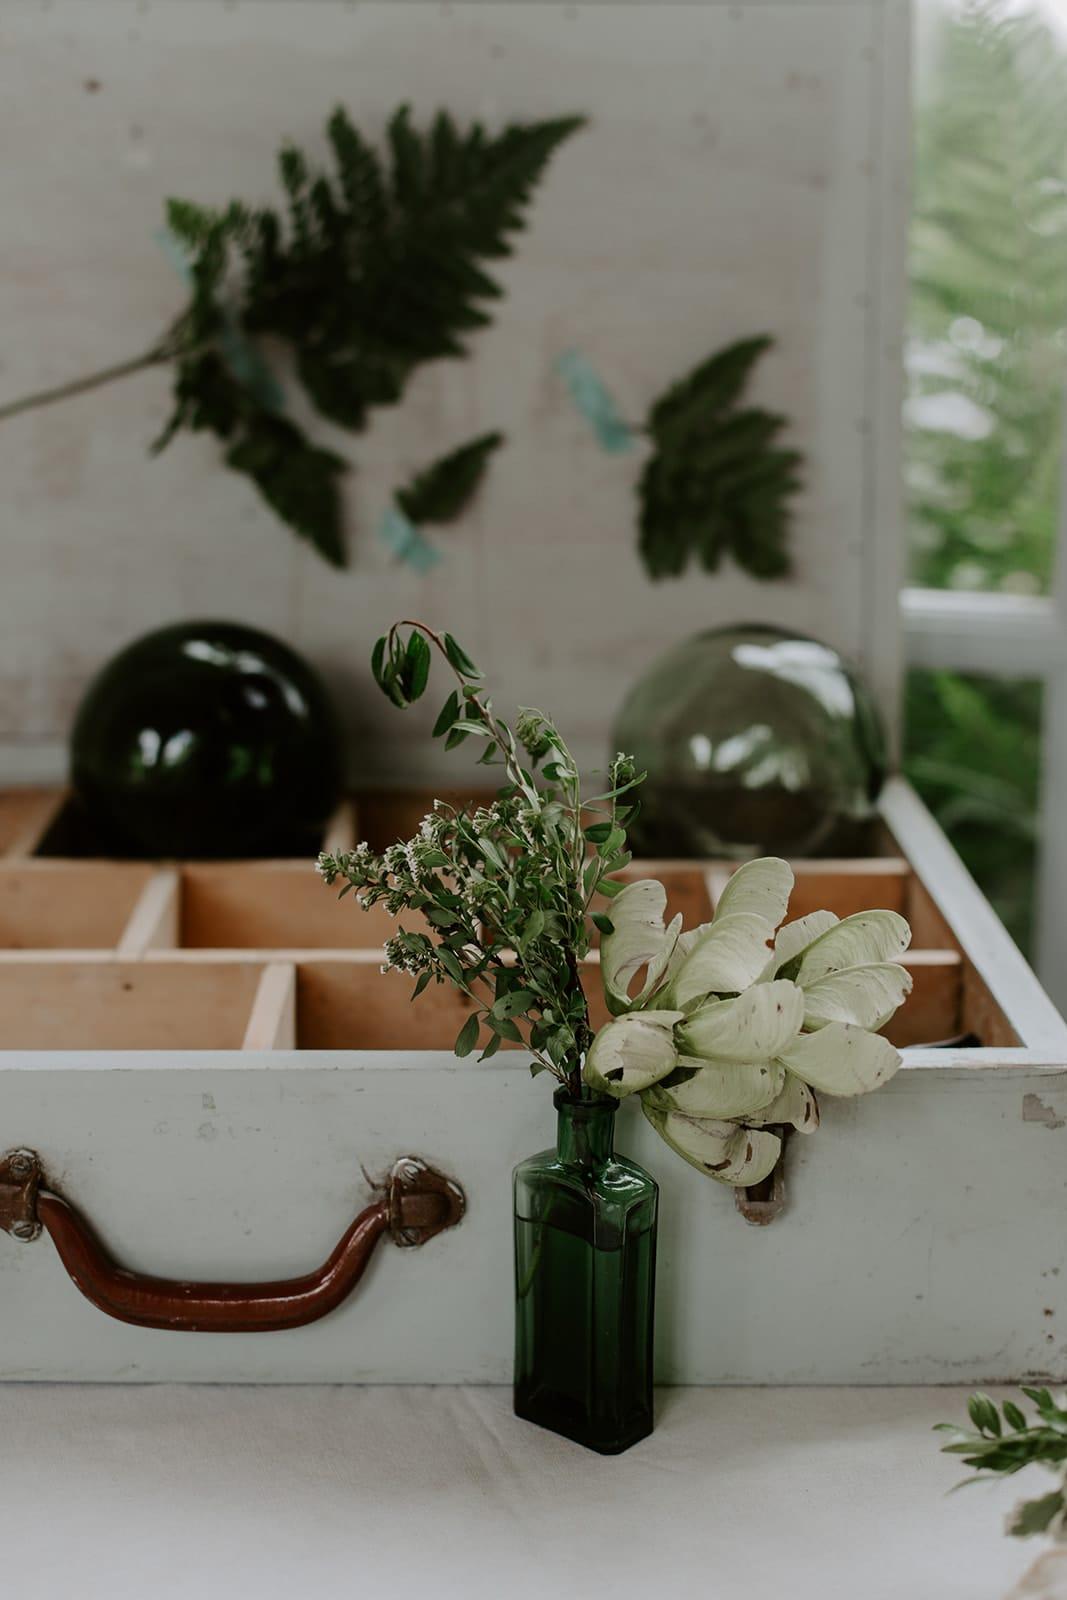 mariage_chateau_la_flocelliere_vendee_flavie_nelly_photographe-134-obonheurdesdames-decoration-mariage-location-vegetal